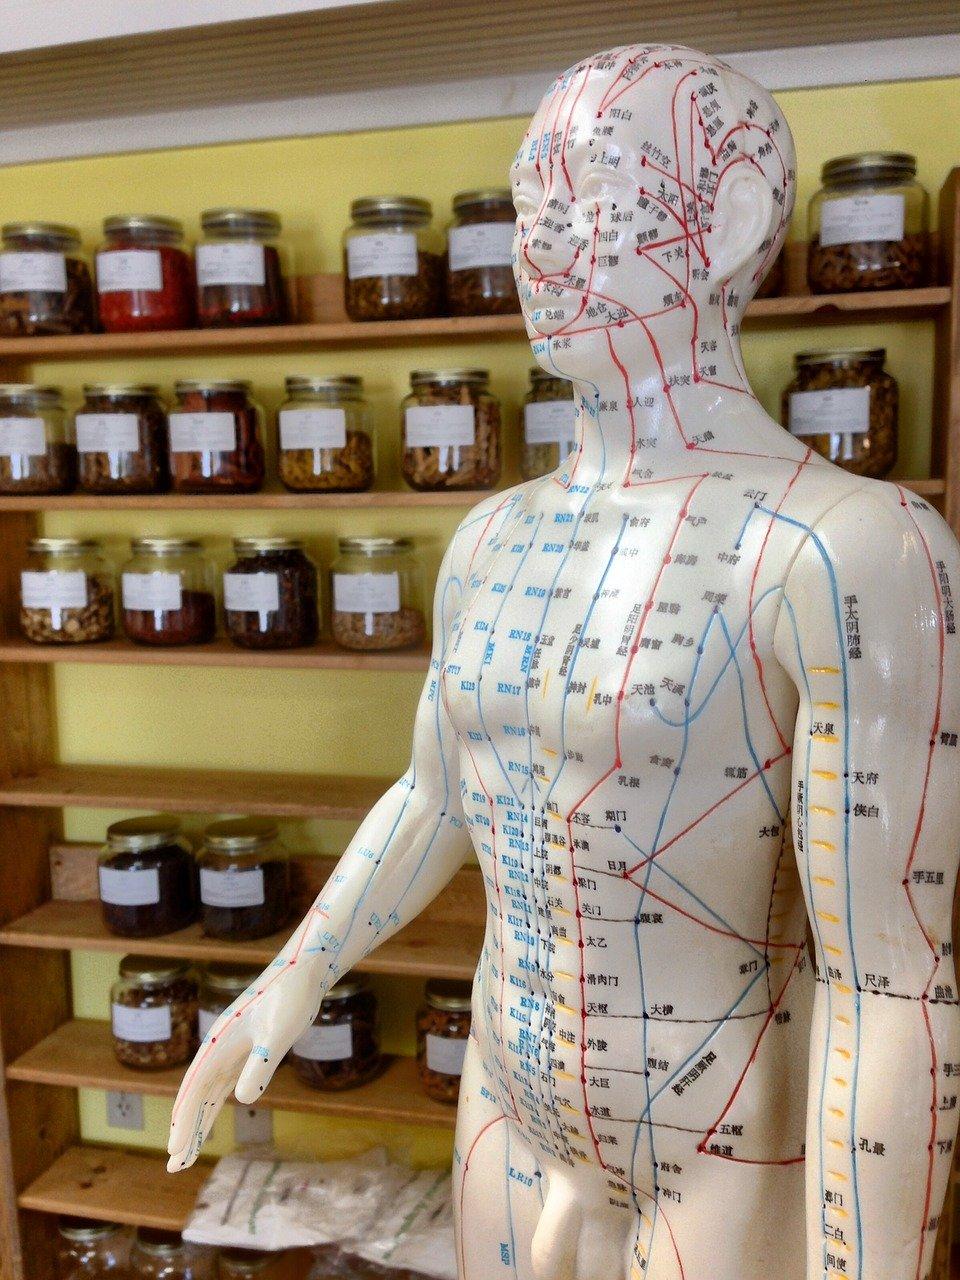 Fysiotherapie en Acupunctuur Praktijk Botterhuis Raalte physiotherapie